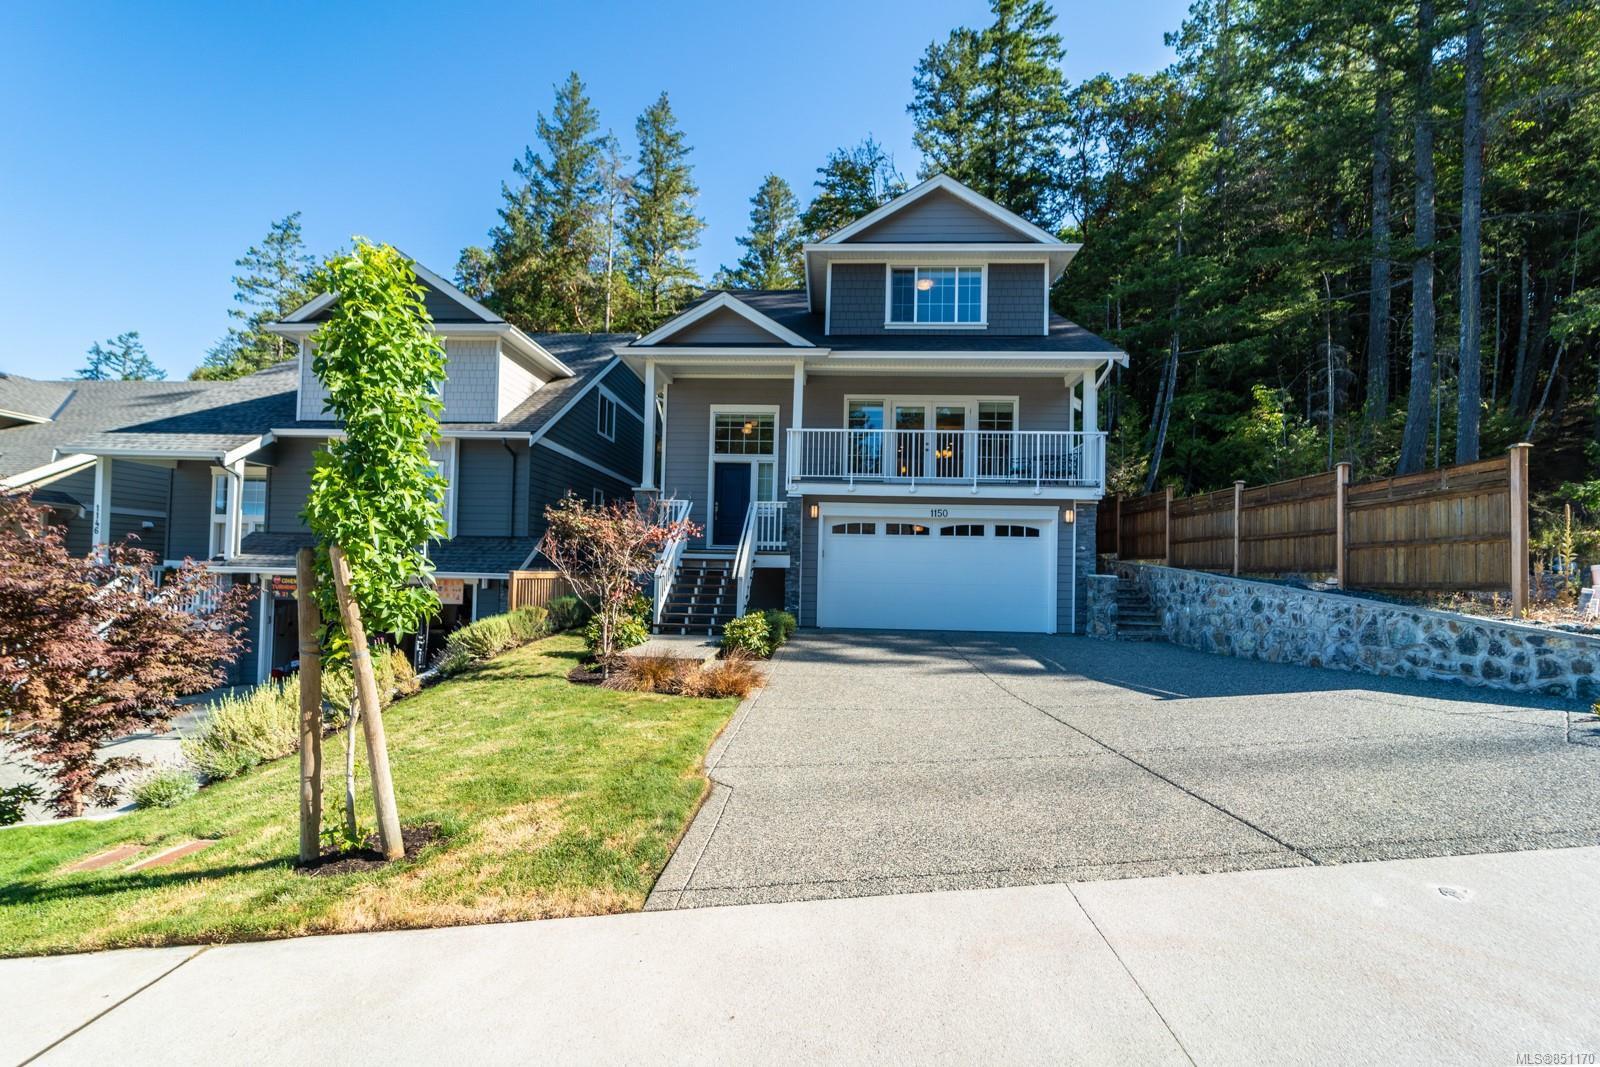 Main Photo: 1150 Braeburn Ave in : La Happy Valley House for sale (Langford)  : MLS®# 851170